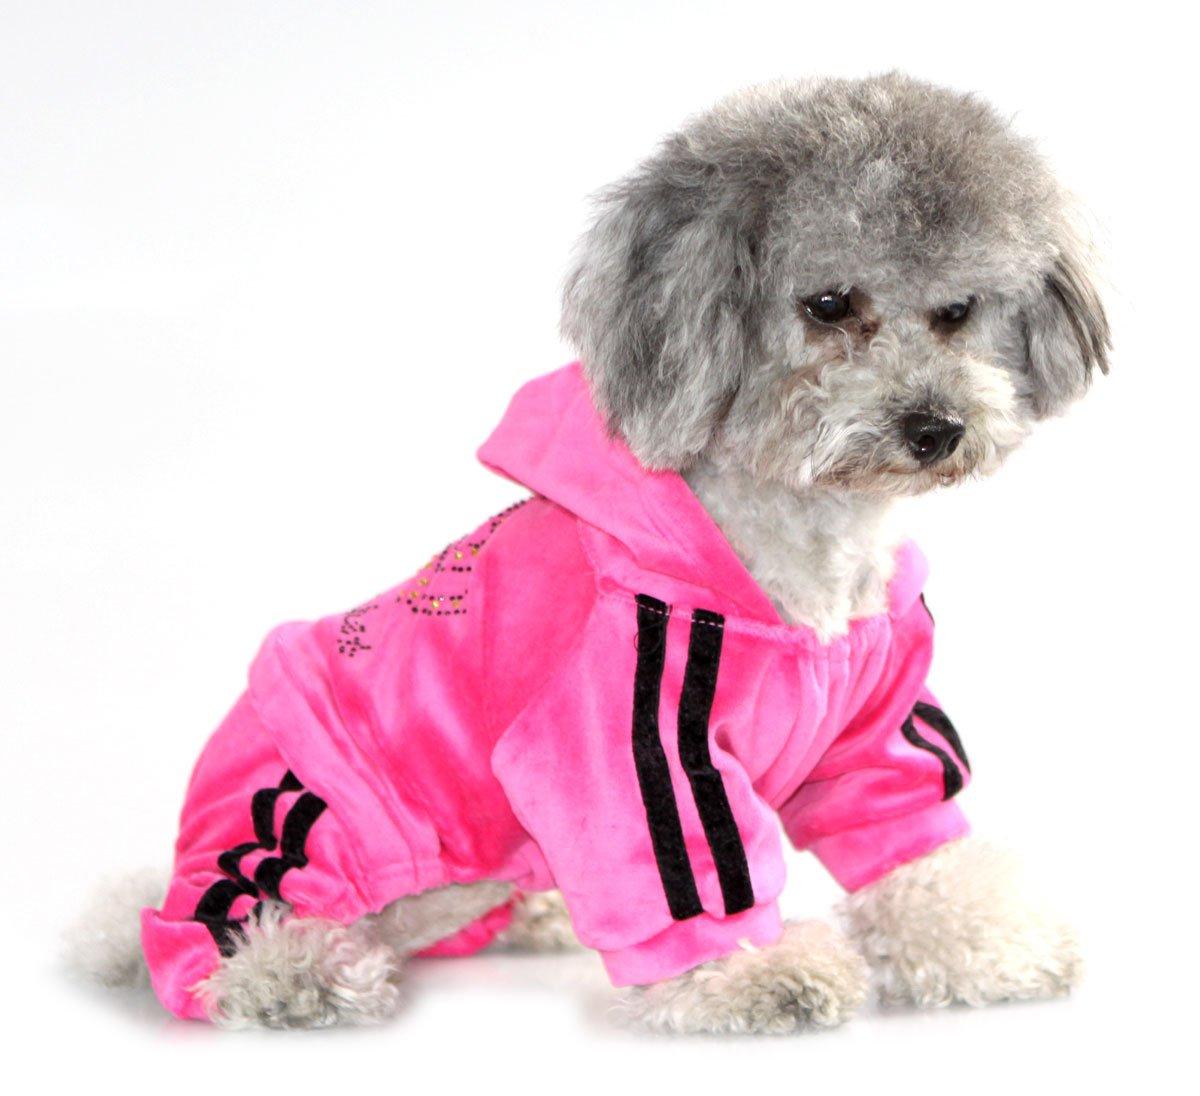 PEGASUS Pet Clothes for Puppy Cat Small Dog Soft Velvet Crown Jumpsuit Coat Hooide Pajamas Tracksuit Pink M